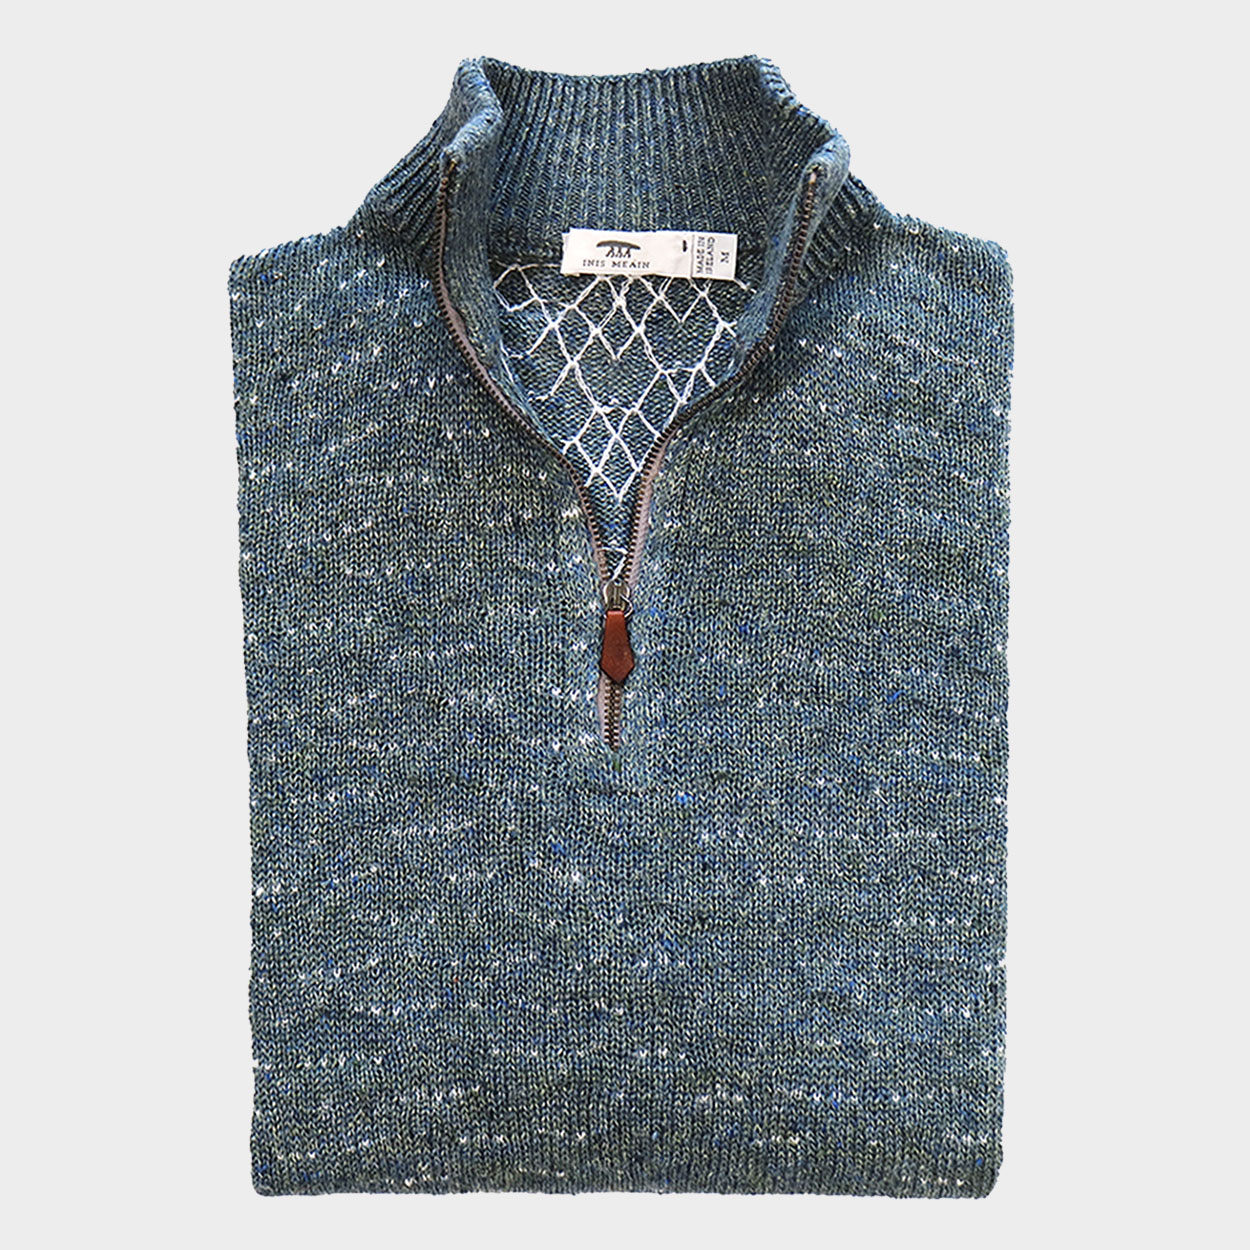 Inis Meáin Knitting Co. Wave Stitch Zip Neck 100% Linen